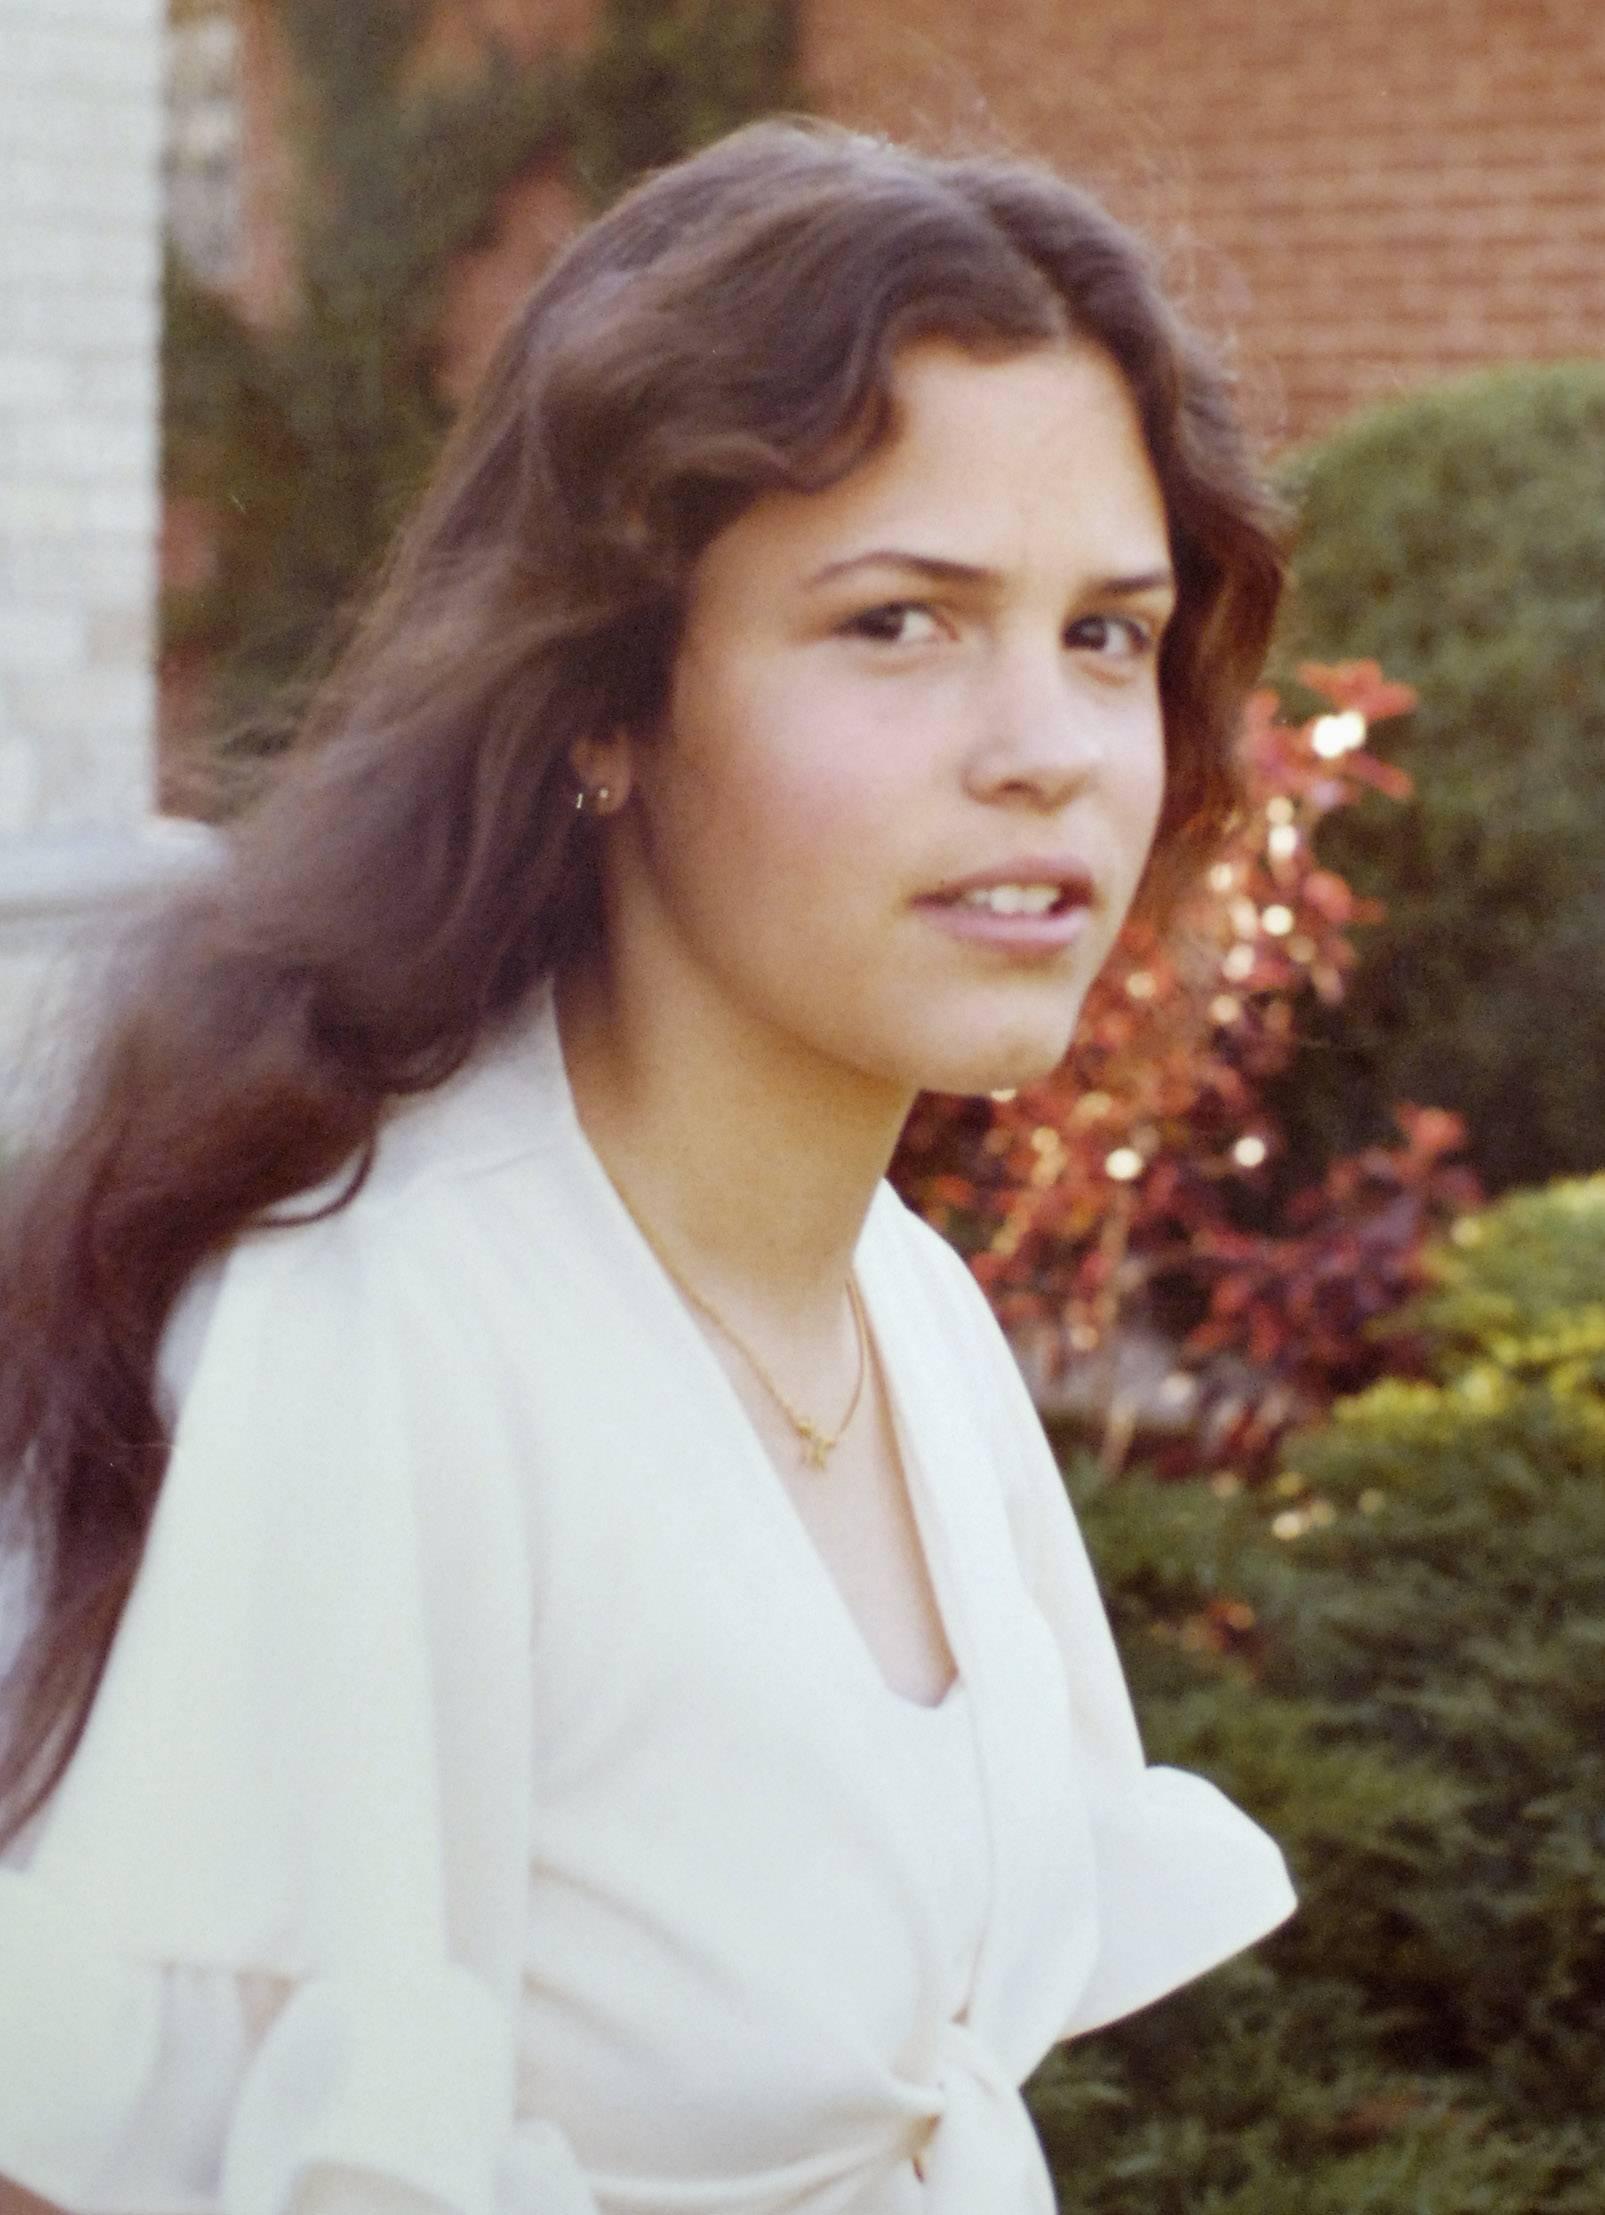 mount prospect teen u0026 39 s 1976 disappearance still haunts